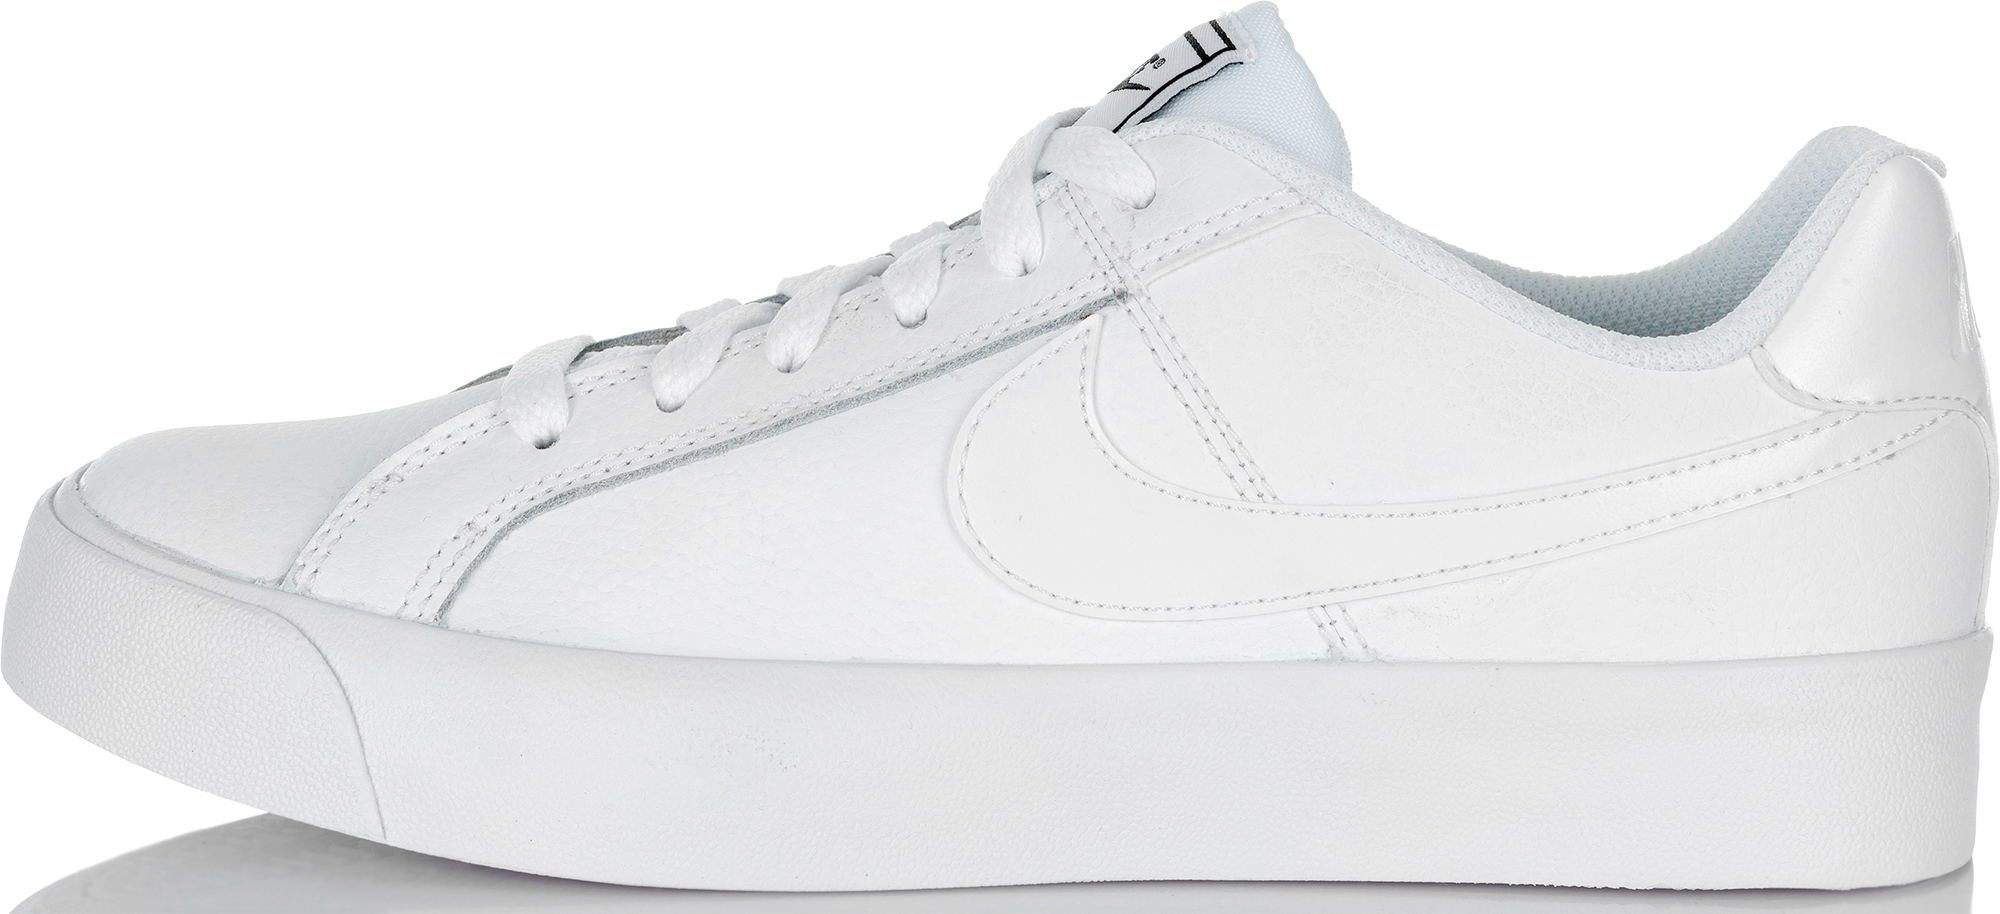 Nike Кроссовки женские Nike Court Royale AC, размер 39 кроссовки для тенниса мужские nike court lite цвет белый 845021 100 размер 10 5 43 5